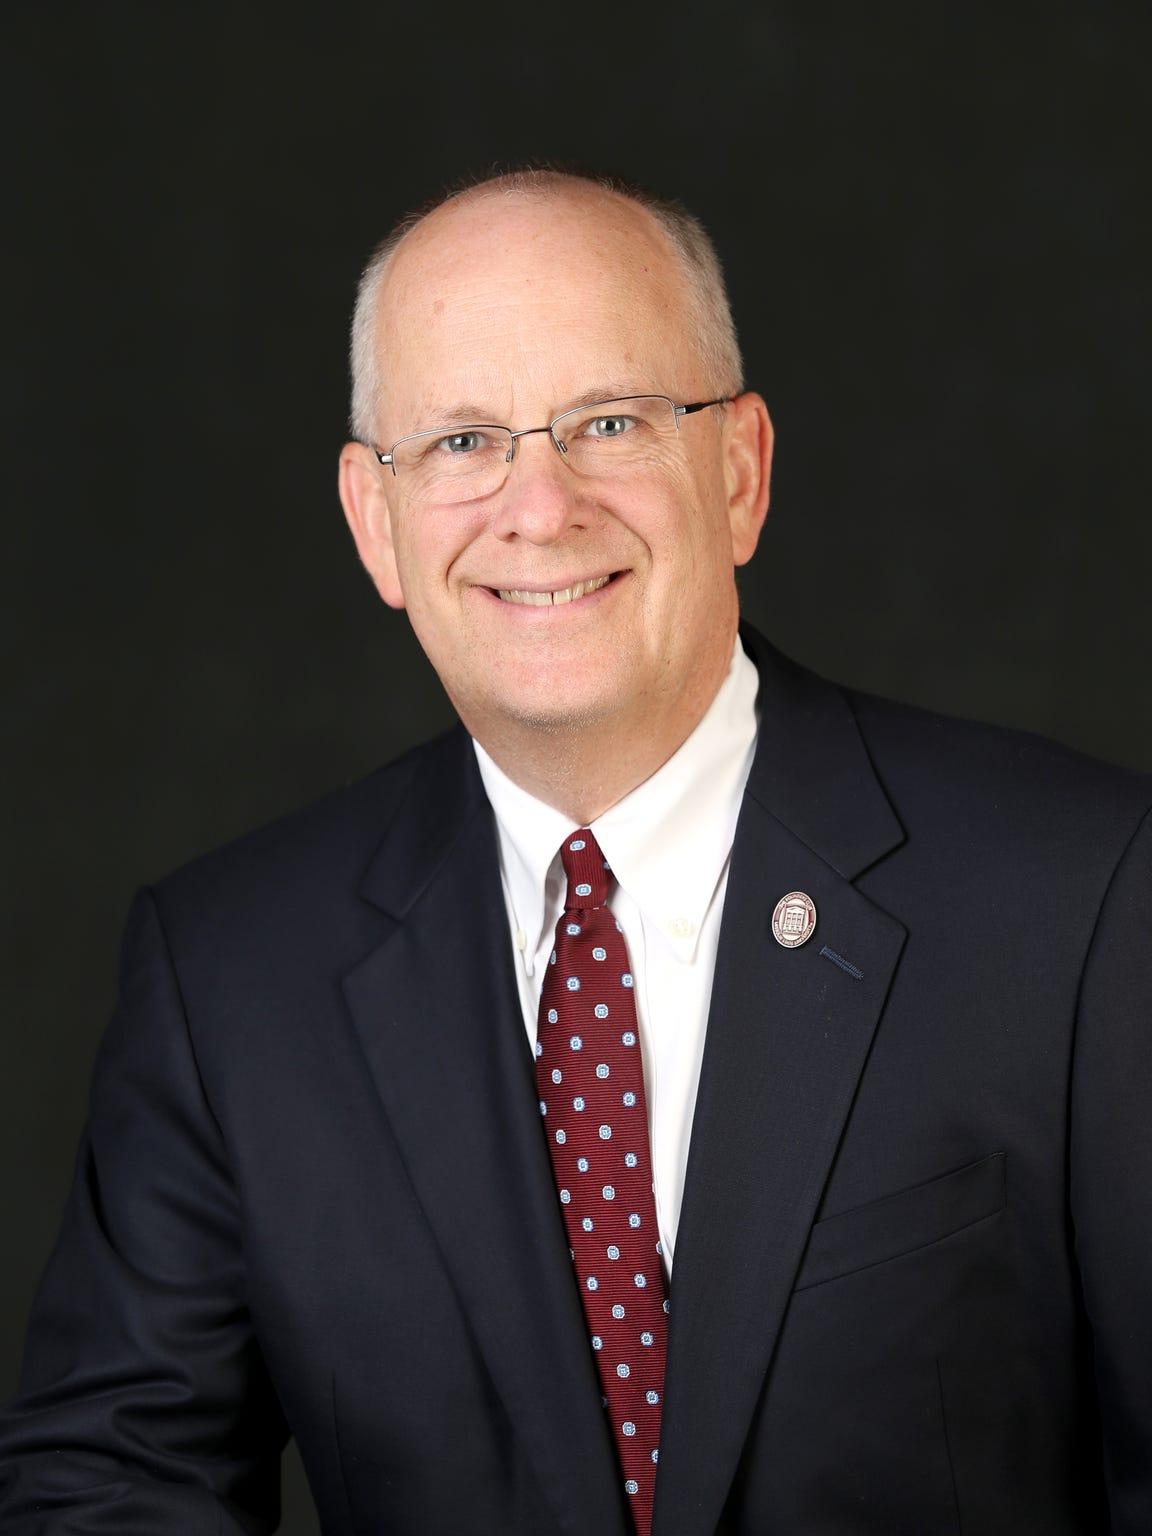 Clif Smart, president of Missouri State University